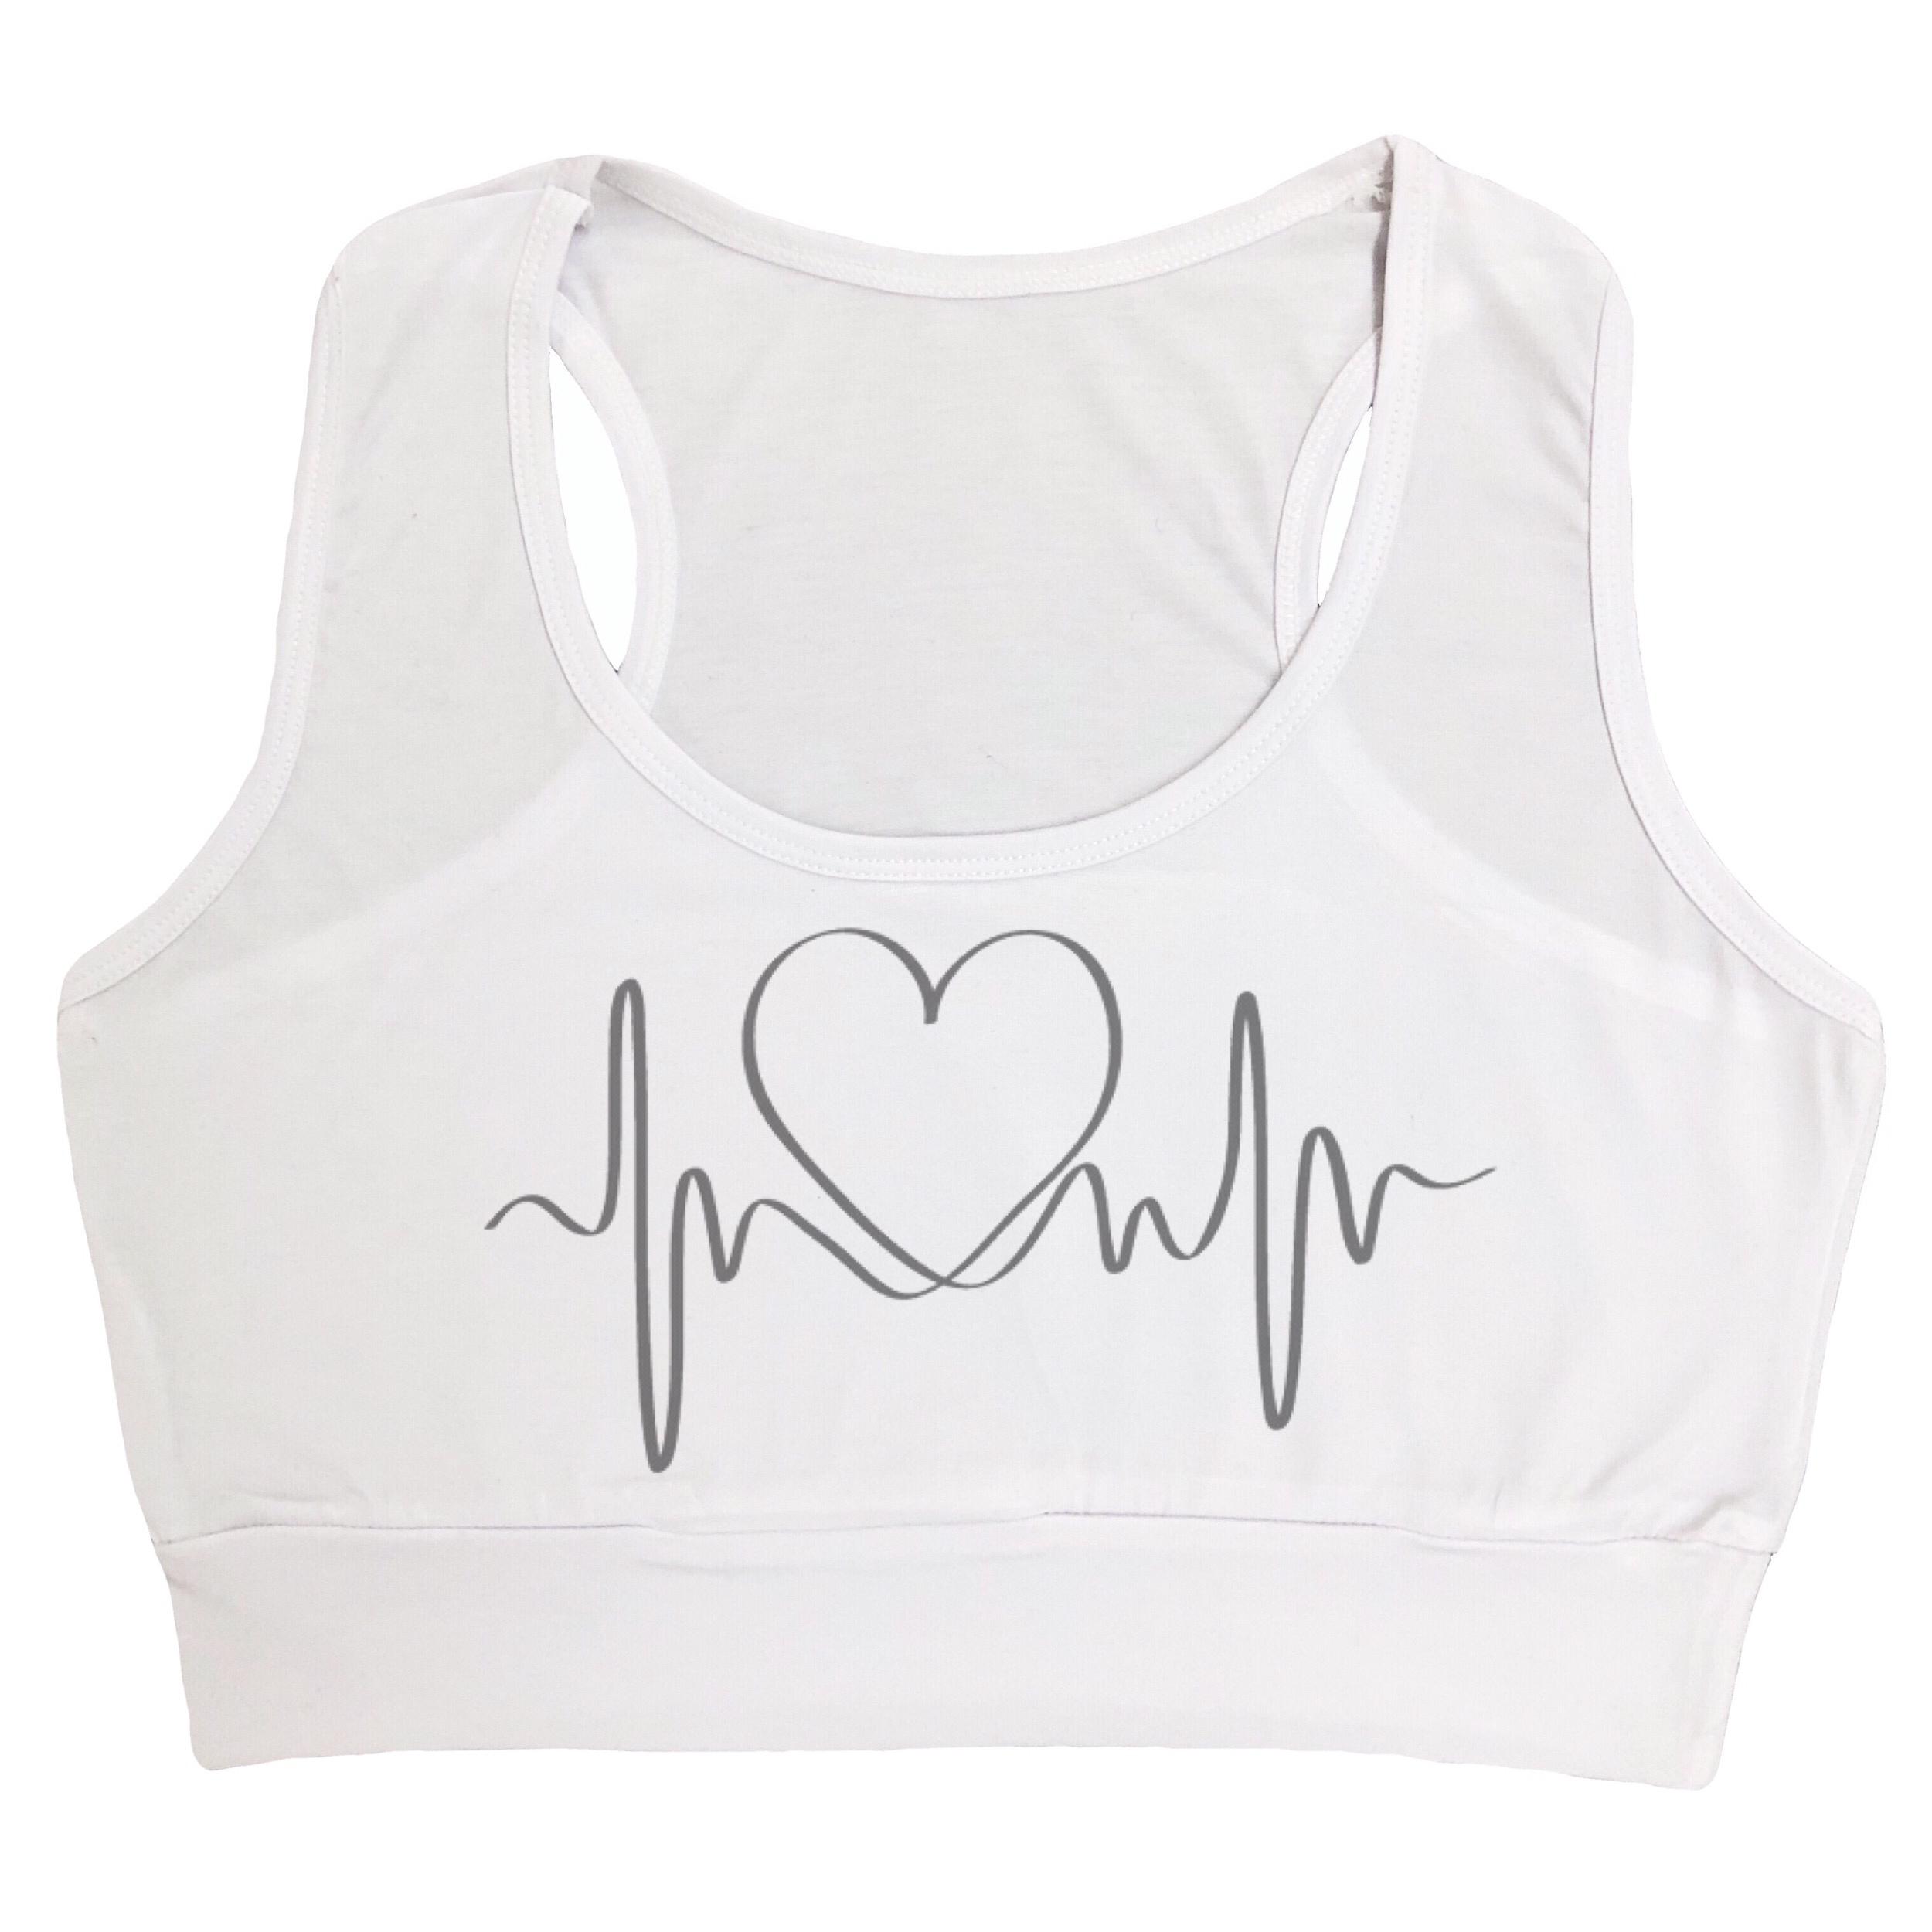 نیم تنه زنانه طرح قلب کد 47